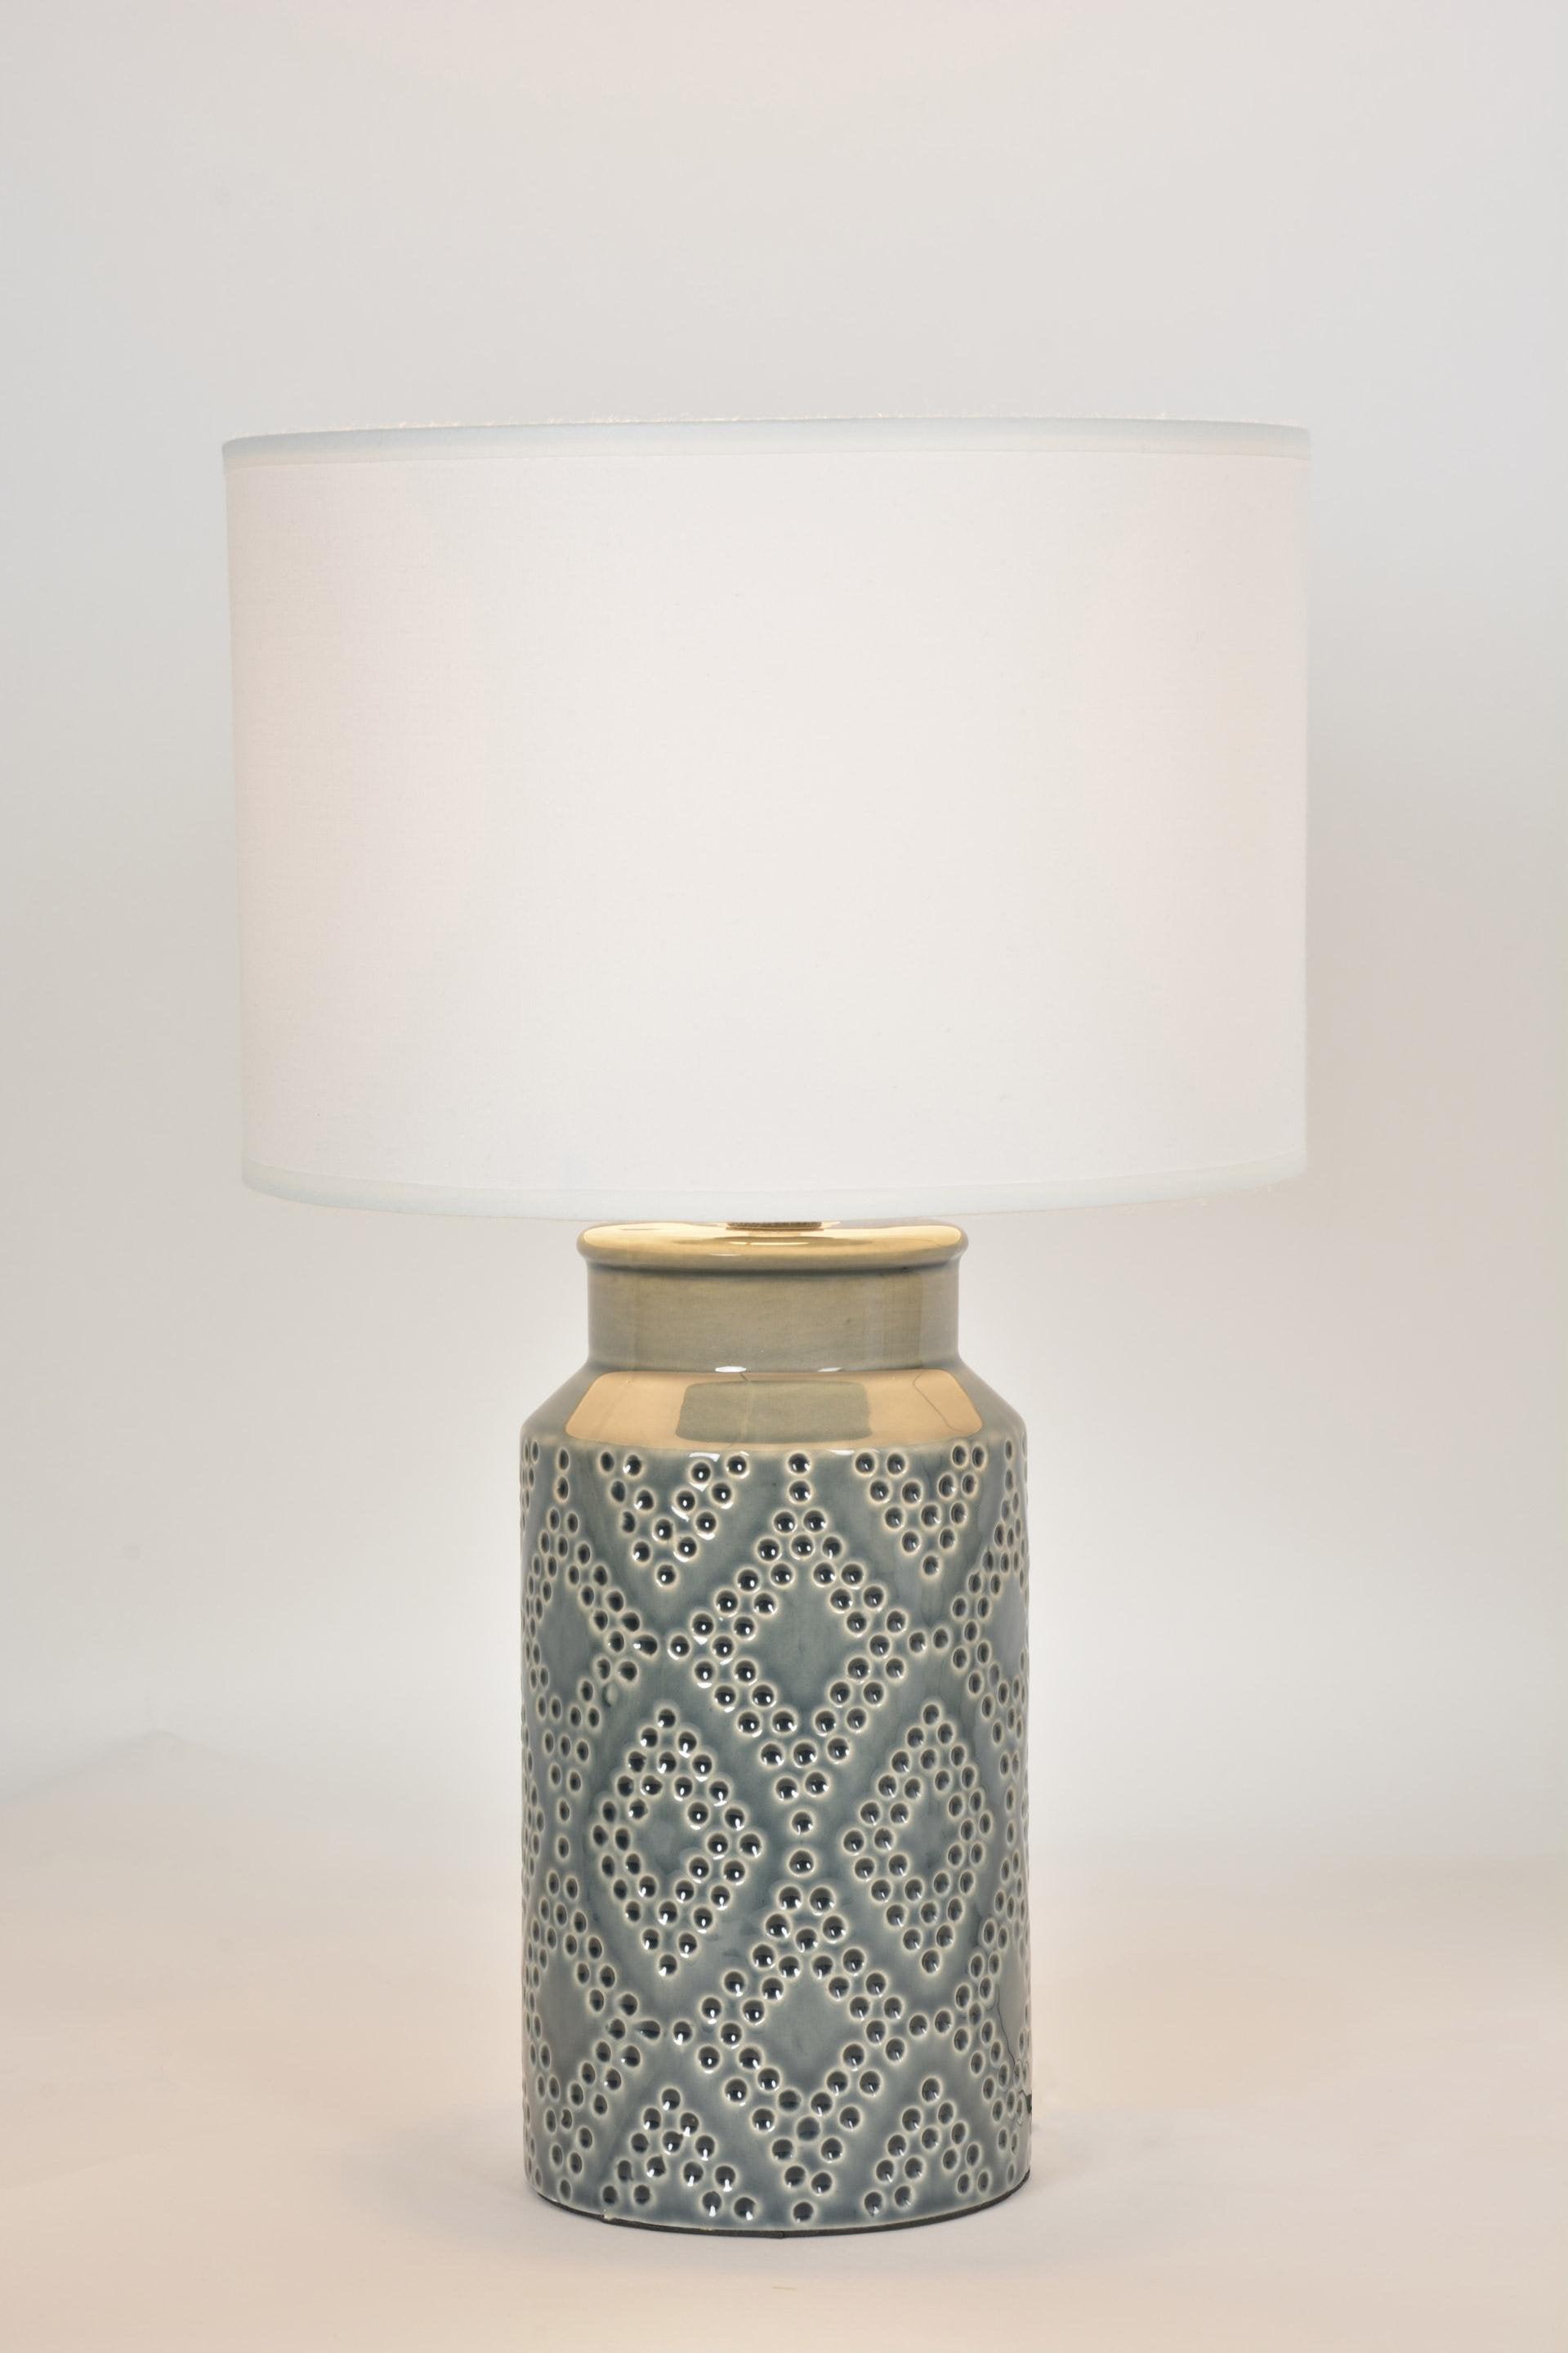 Lampe Meilleur DesignSur Poser Prix PiedÀ Au 8N0Ovmnw